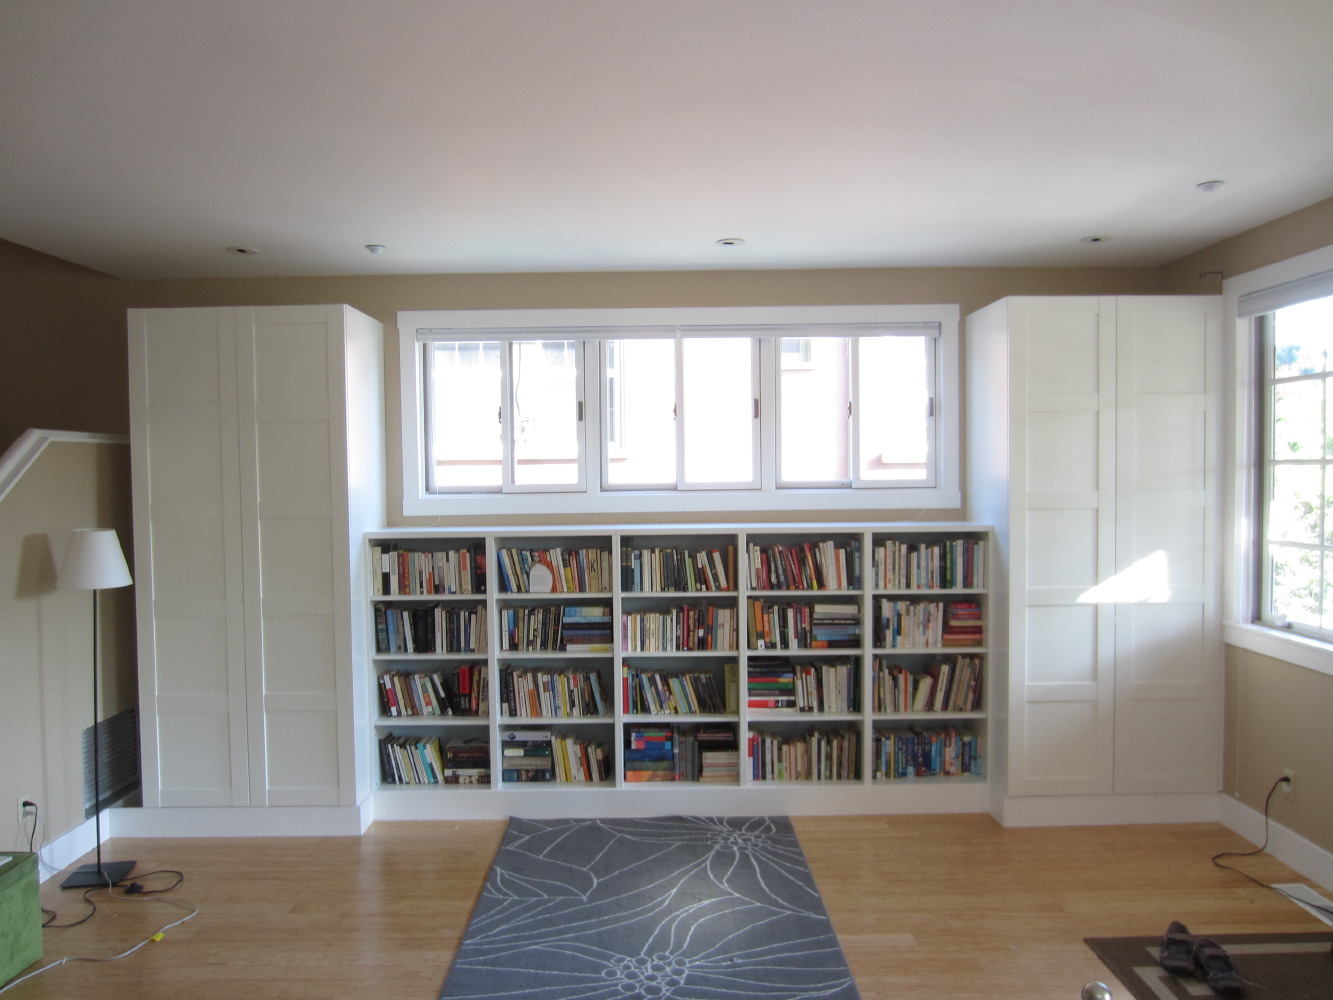 living room built in bookshelves and closets using besta. Black Bedroom Furniture Sets. Home Design Ideas